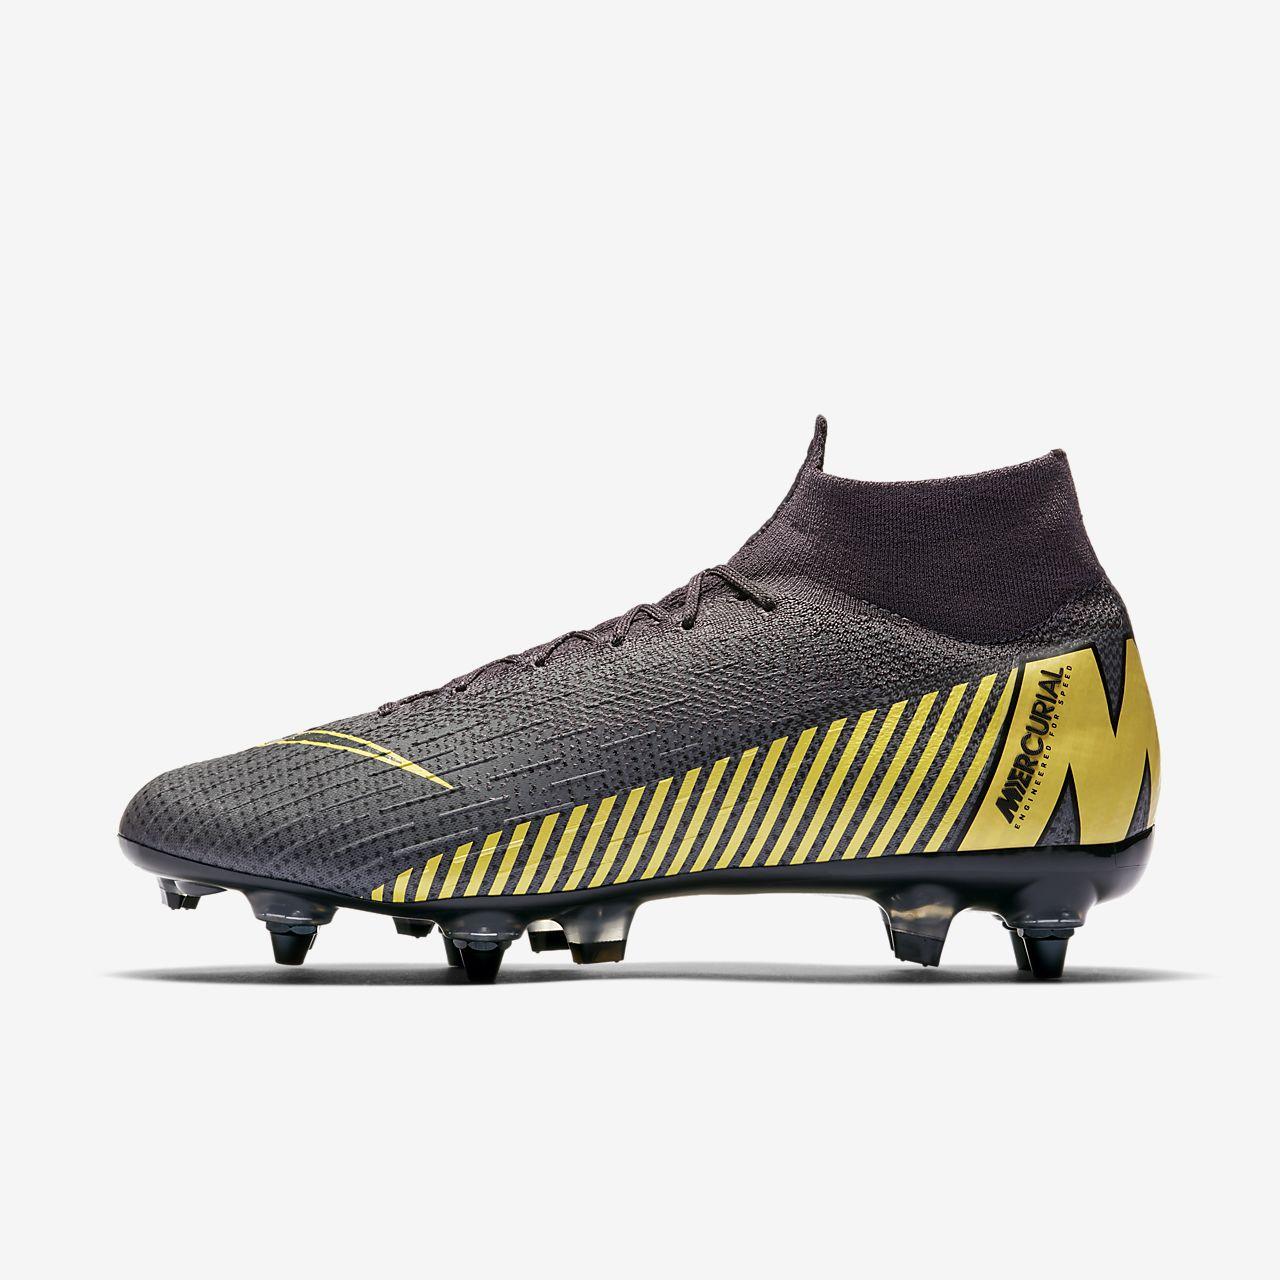 Футбольные бутсы для игры на мягком грунте Nike Mercurial Superfly 360 Elite SG-PRO Anti-Clog